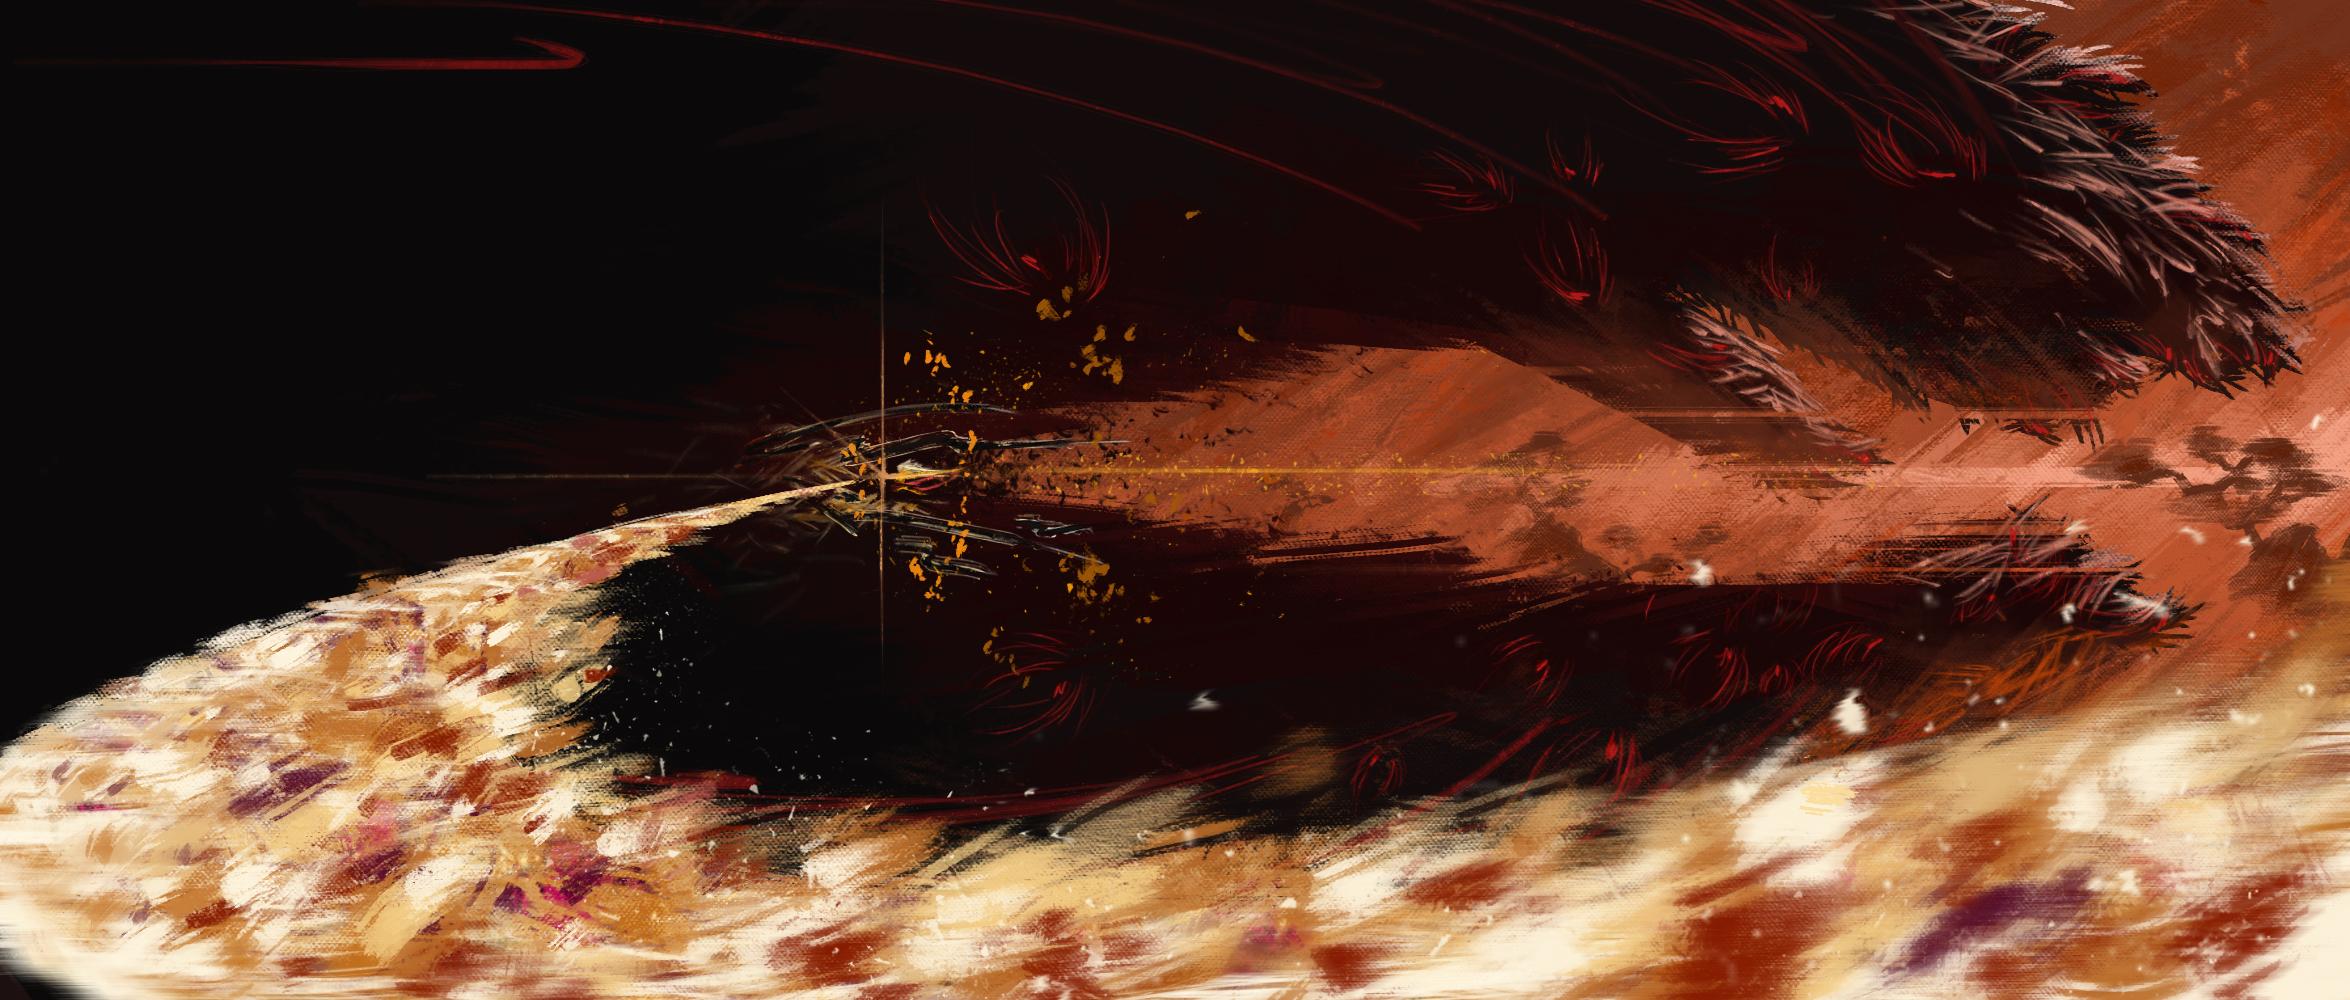 Mononoke Sliced